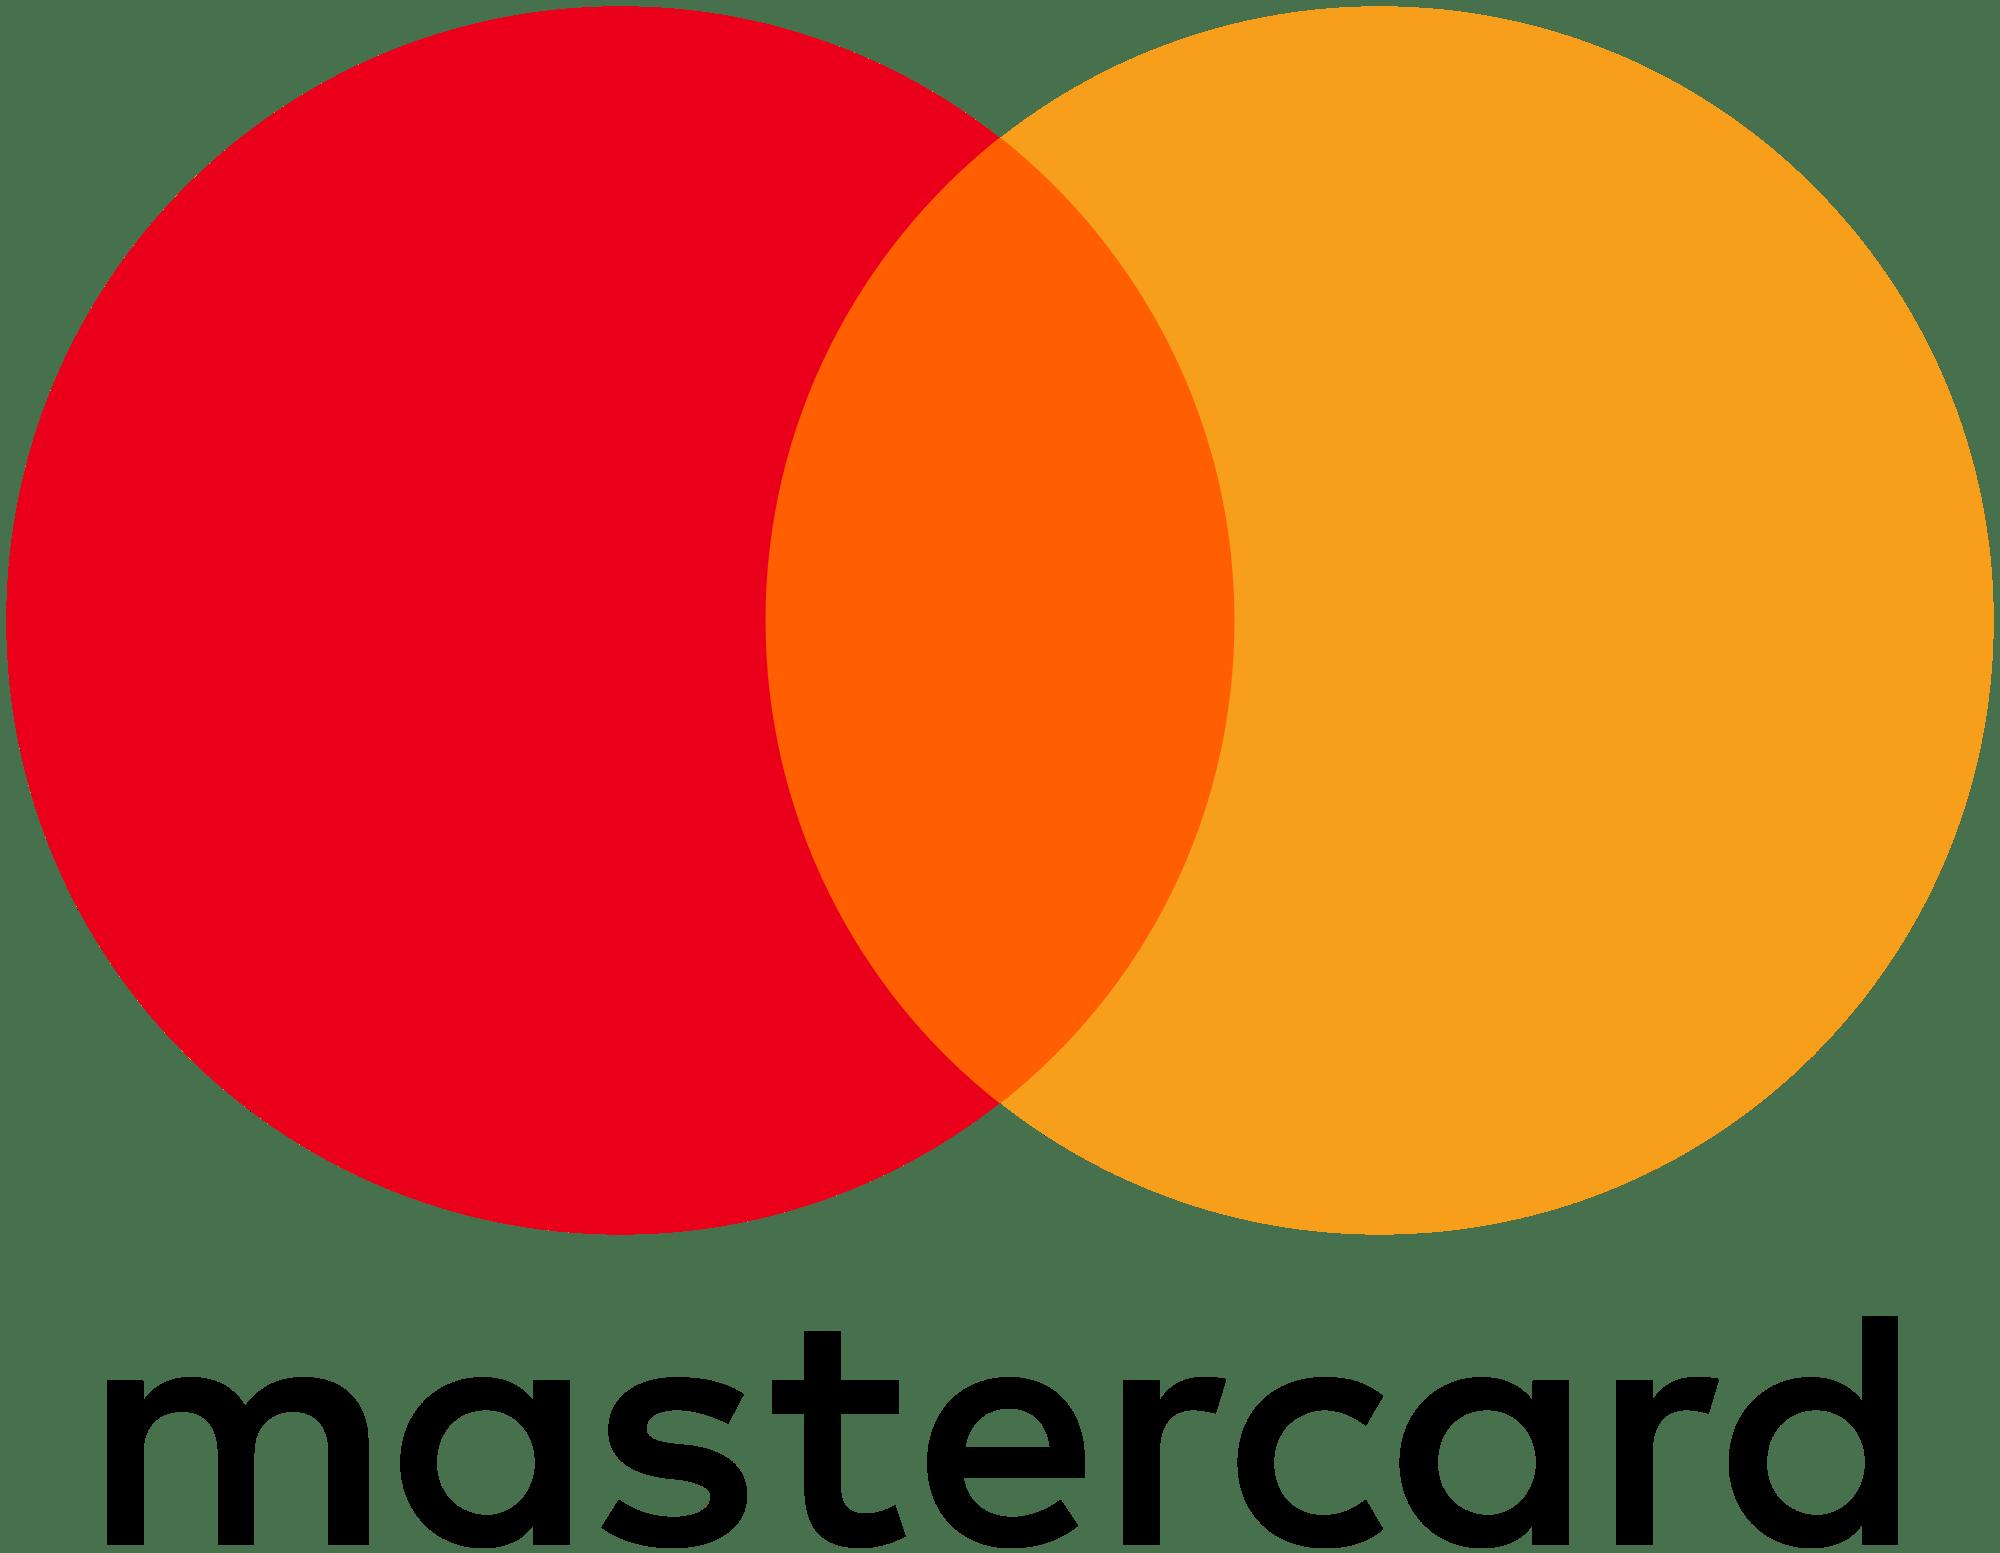 PNG Mastercard Clipart File Logo 6952-PNG Mastercard Clipart File Logo 6952-1